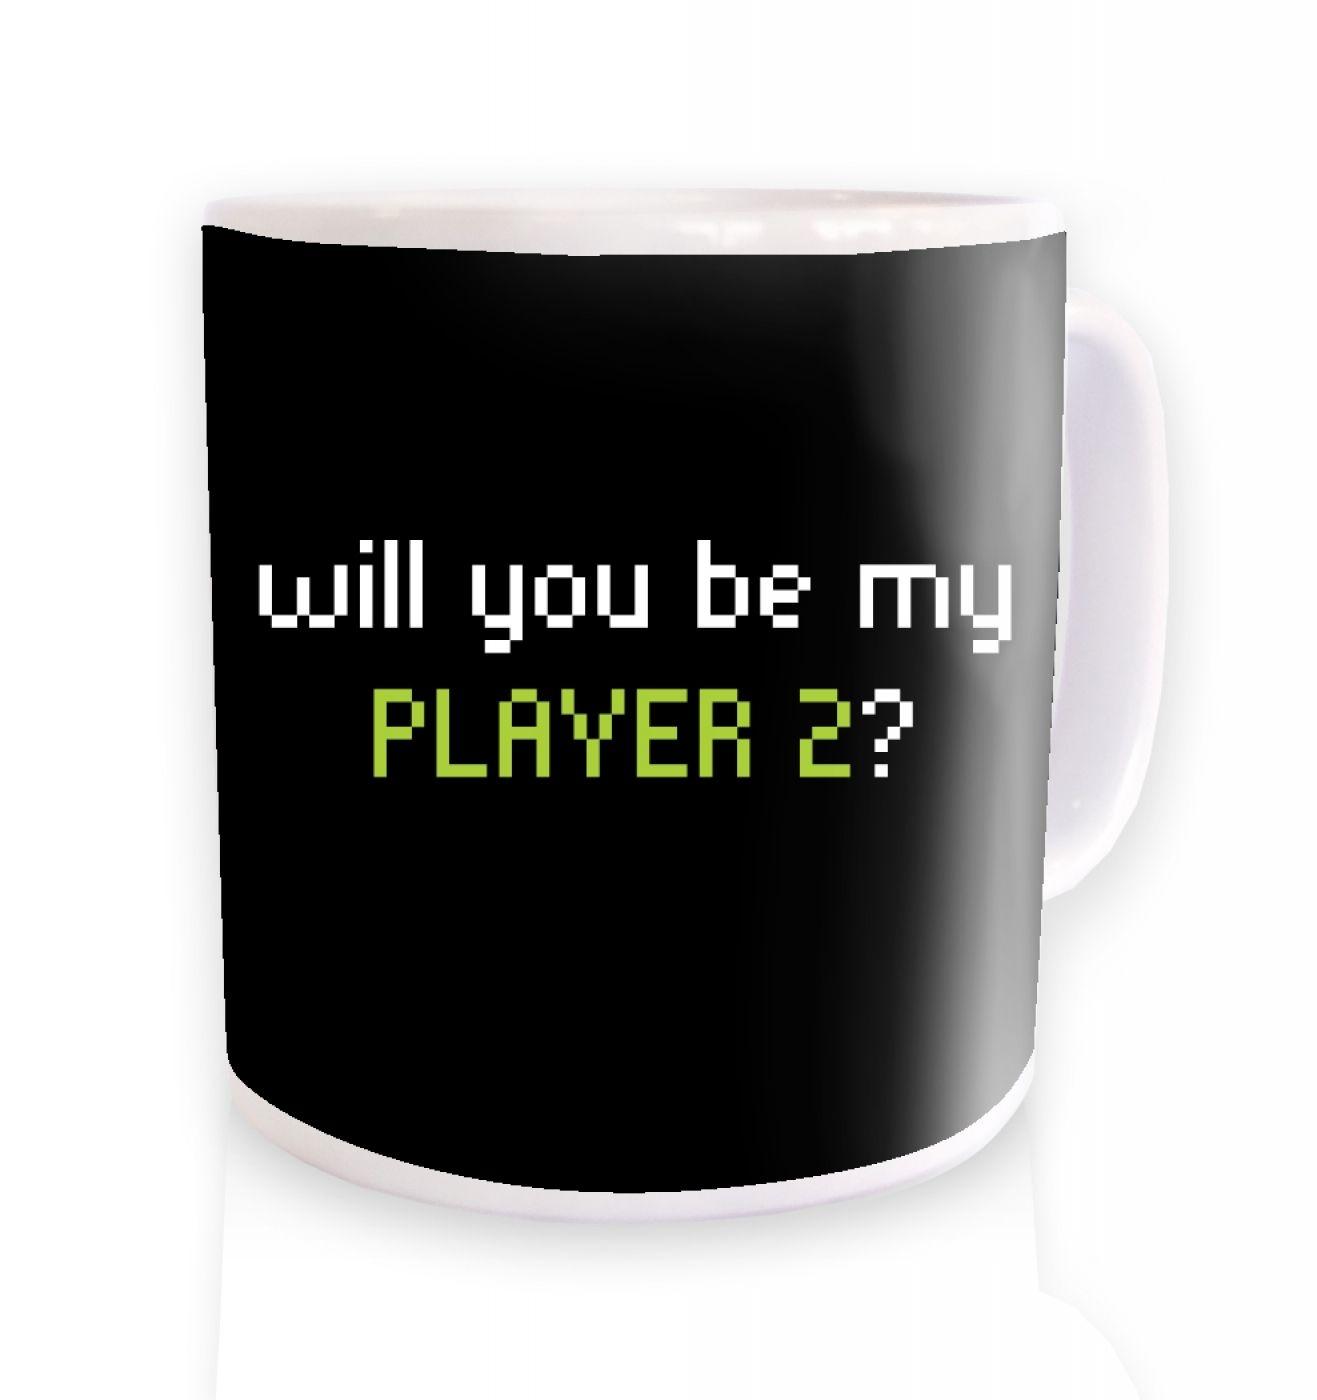 Will You Be My Player 2 ceramic coffee mug